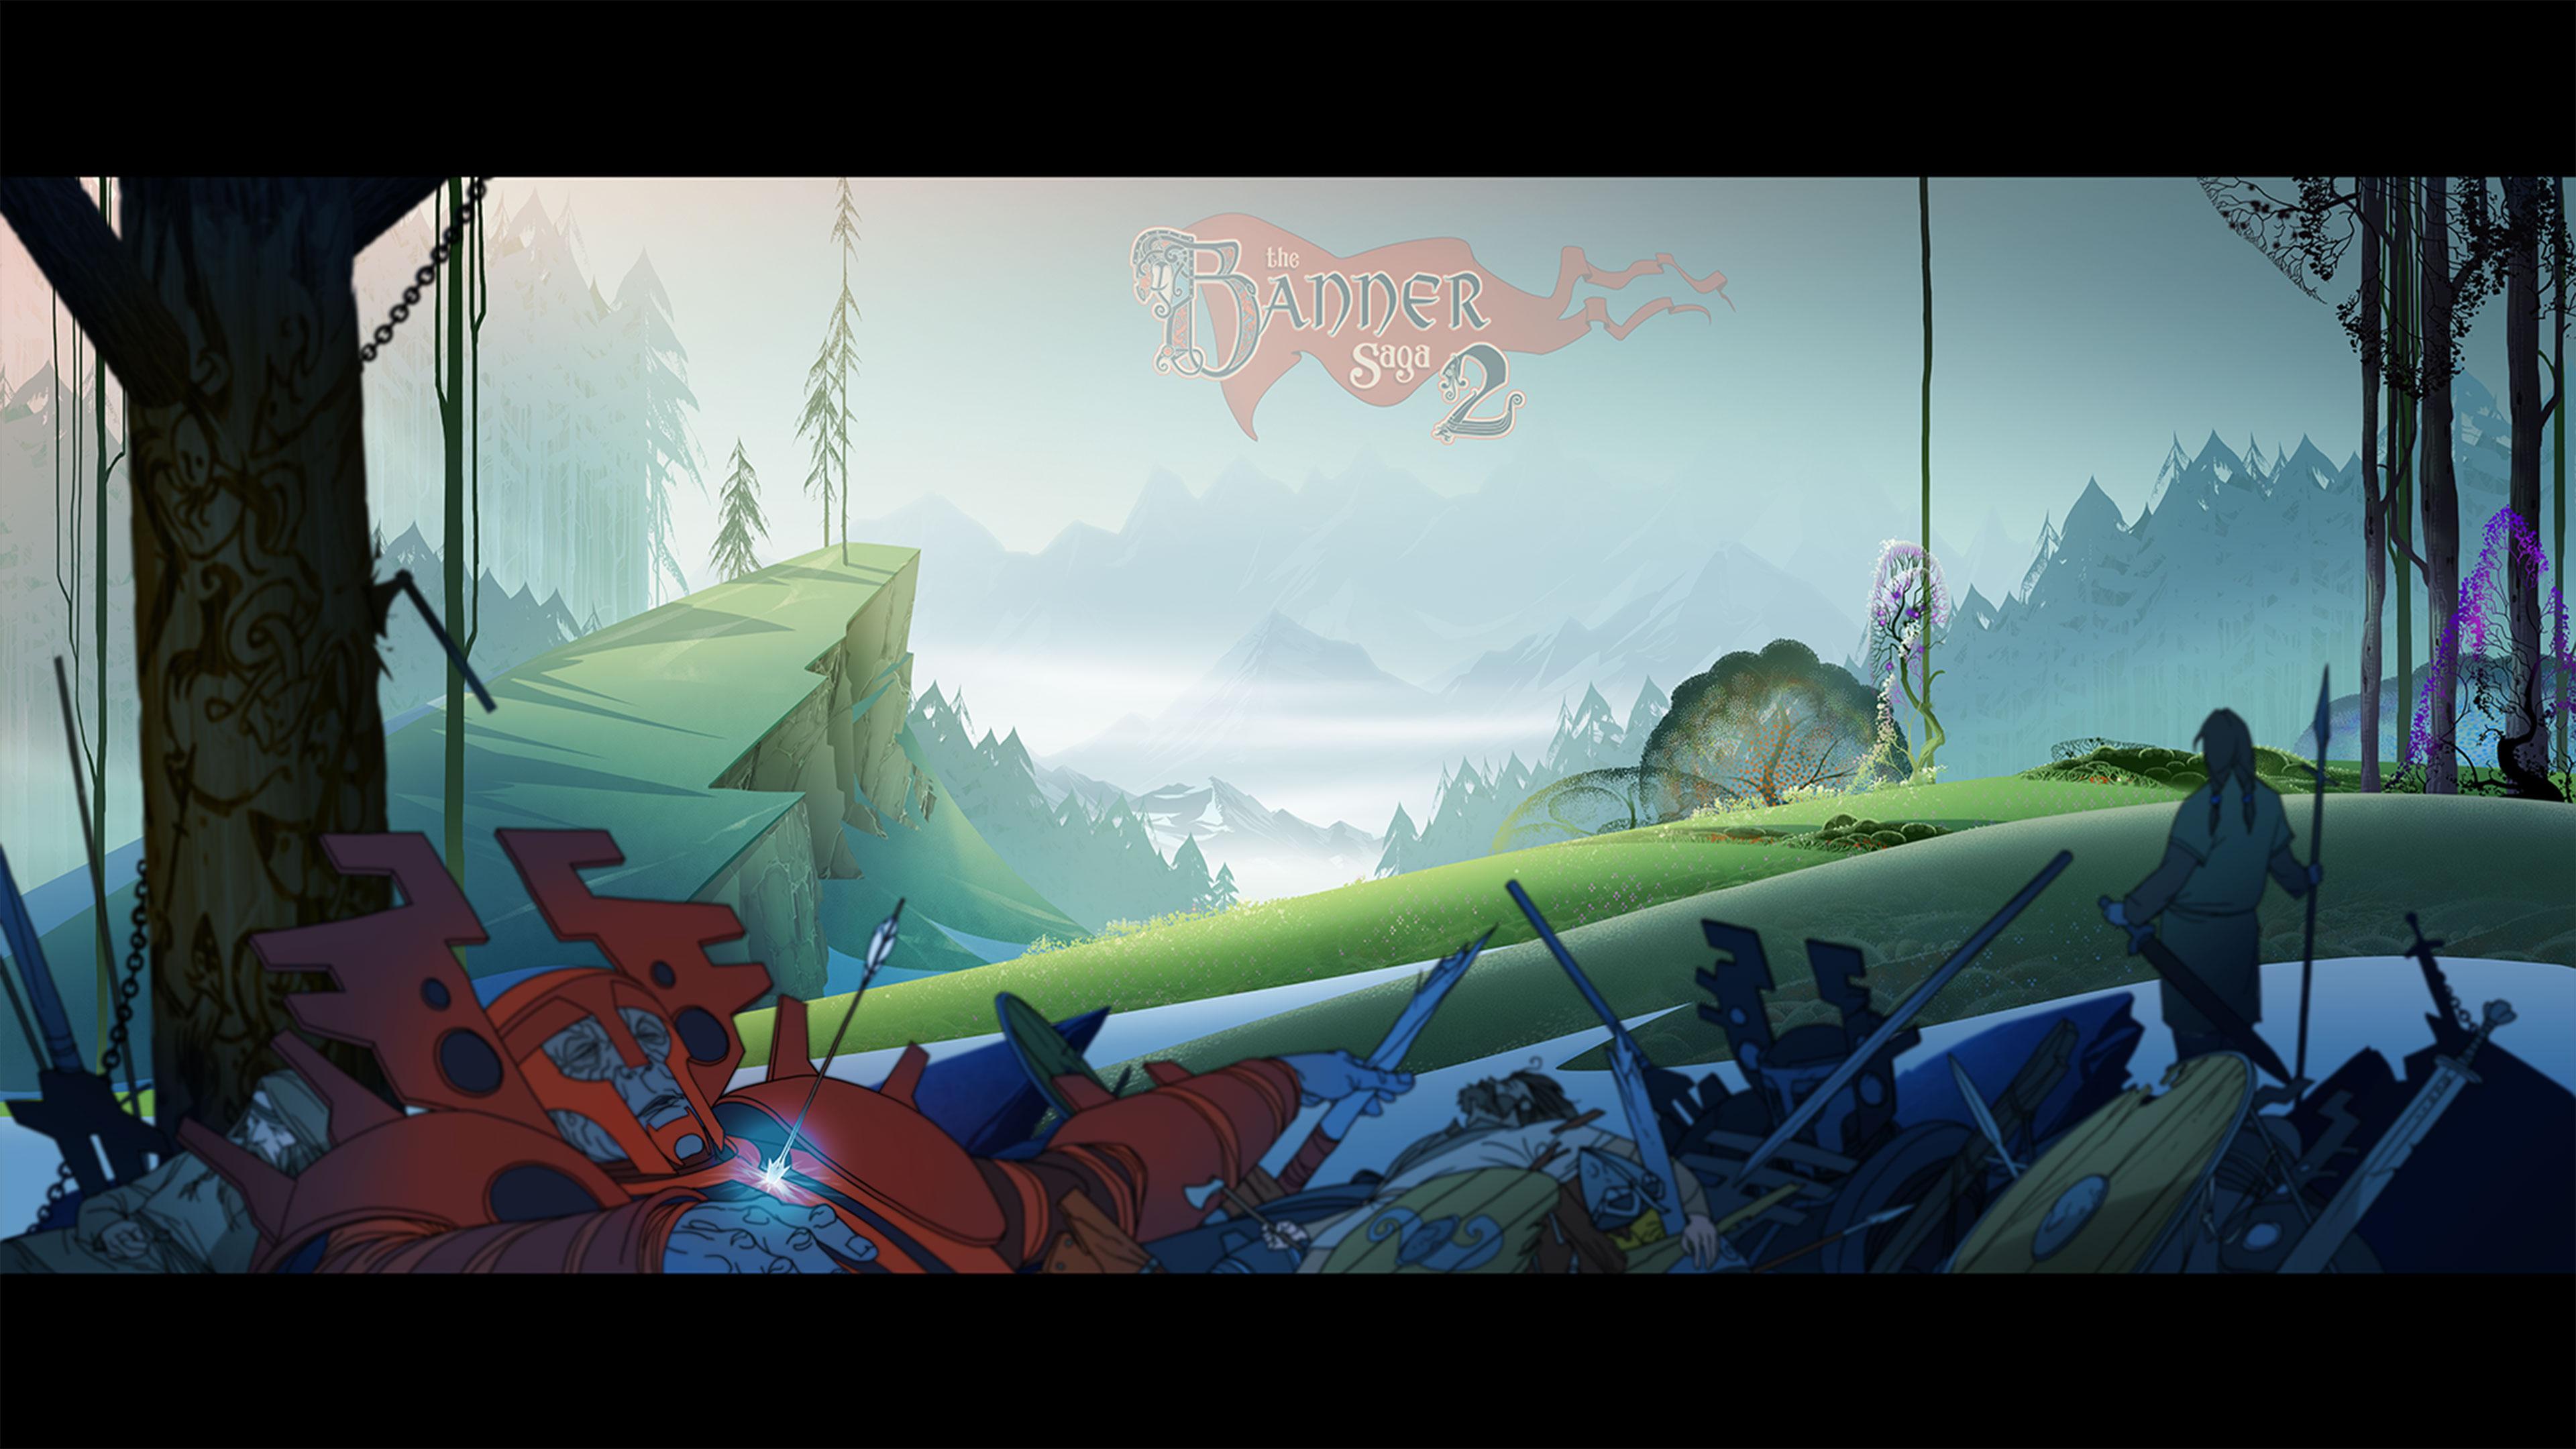 Iphone Hd Wallpapers 1080p The Banner Saga 2 Wallpapers In Ultra Hd 4k Gameranx